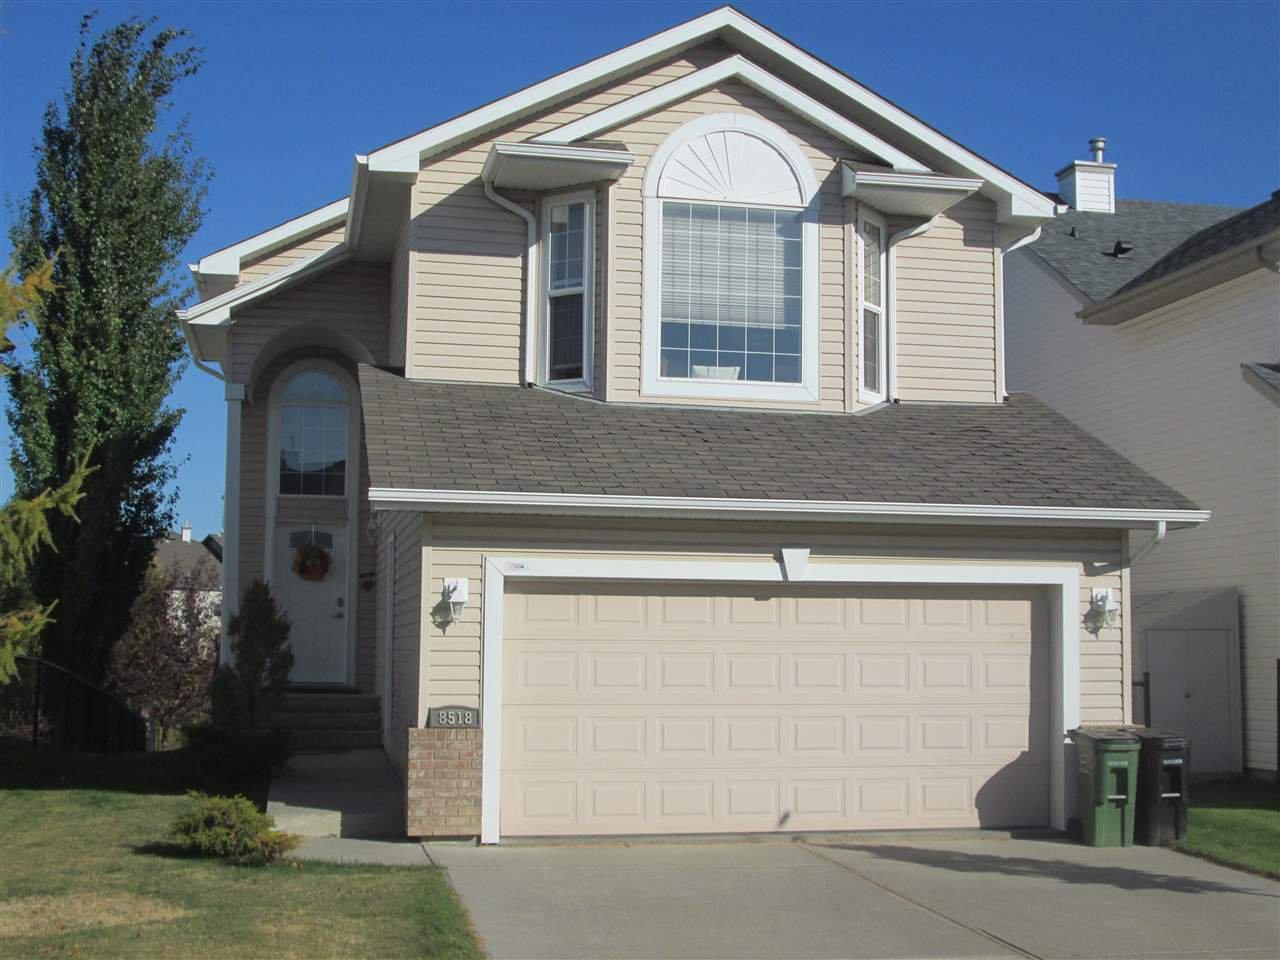 Main Photo: 8518 6 Avenue in Edmonton: Zone 53 House for sale : MLS®# E4216668